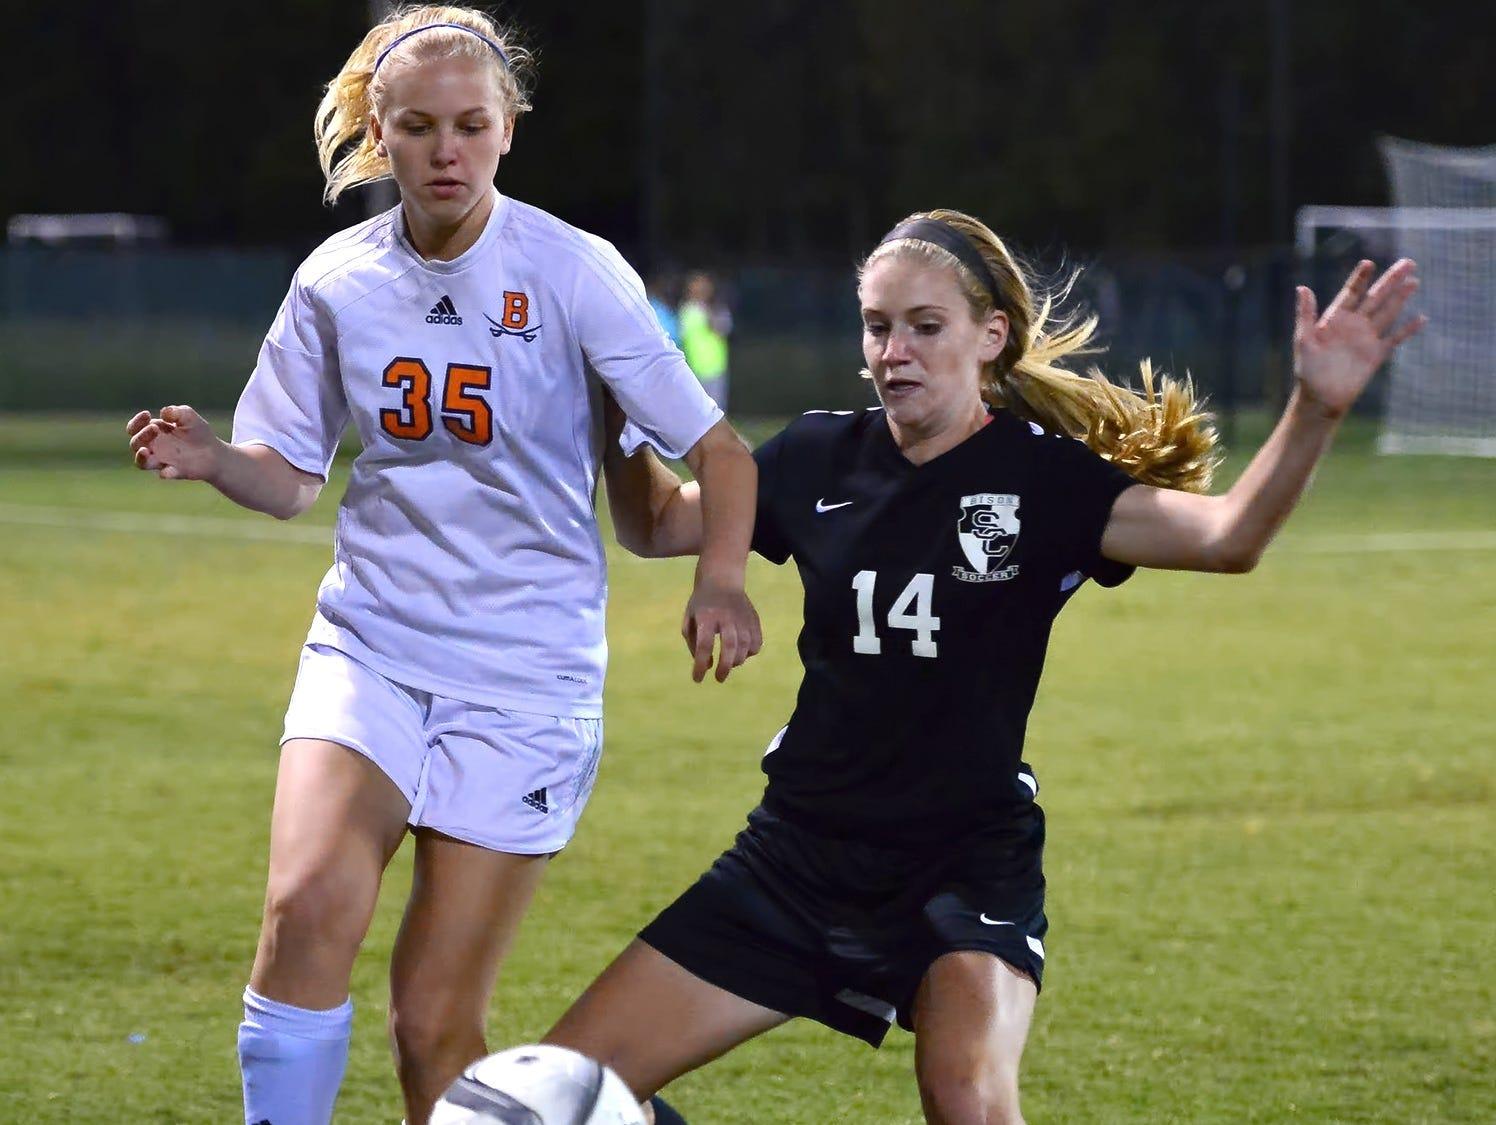 Beech High senior Ana-Carlin Krueger passes to a teammate as Station Camp freshman Morgan Appenrott pressures.